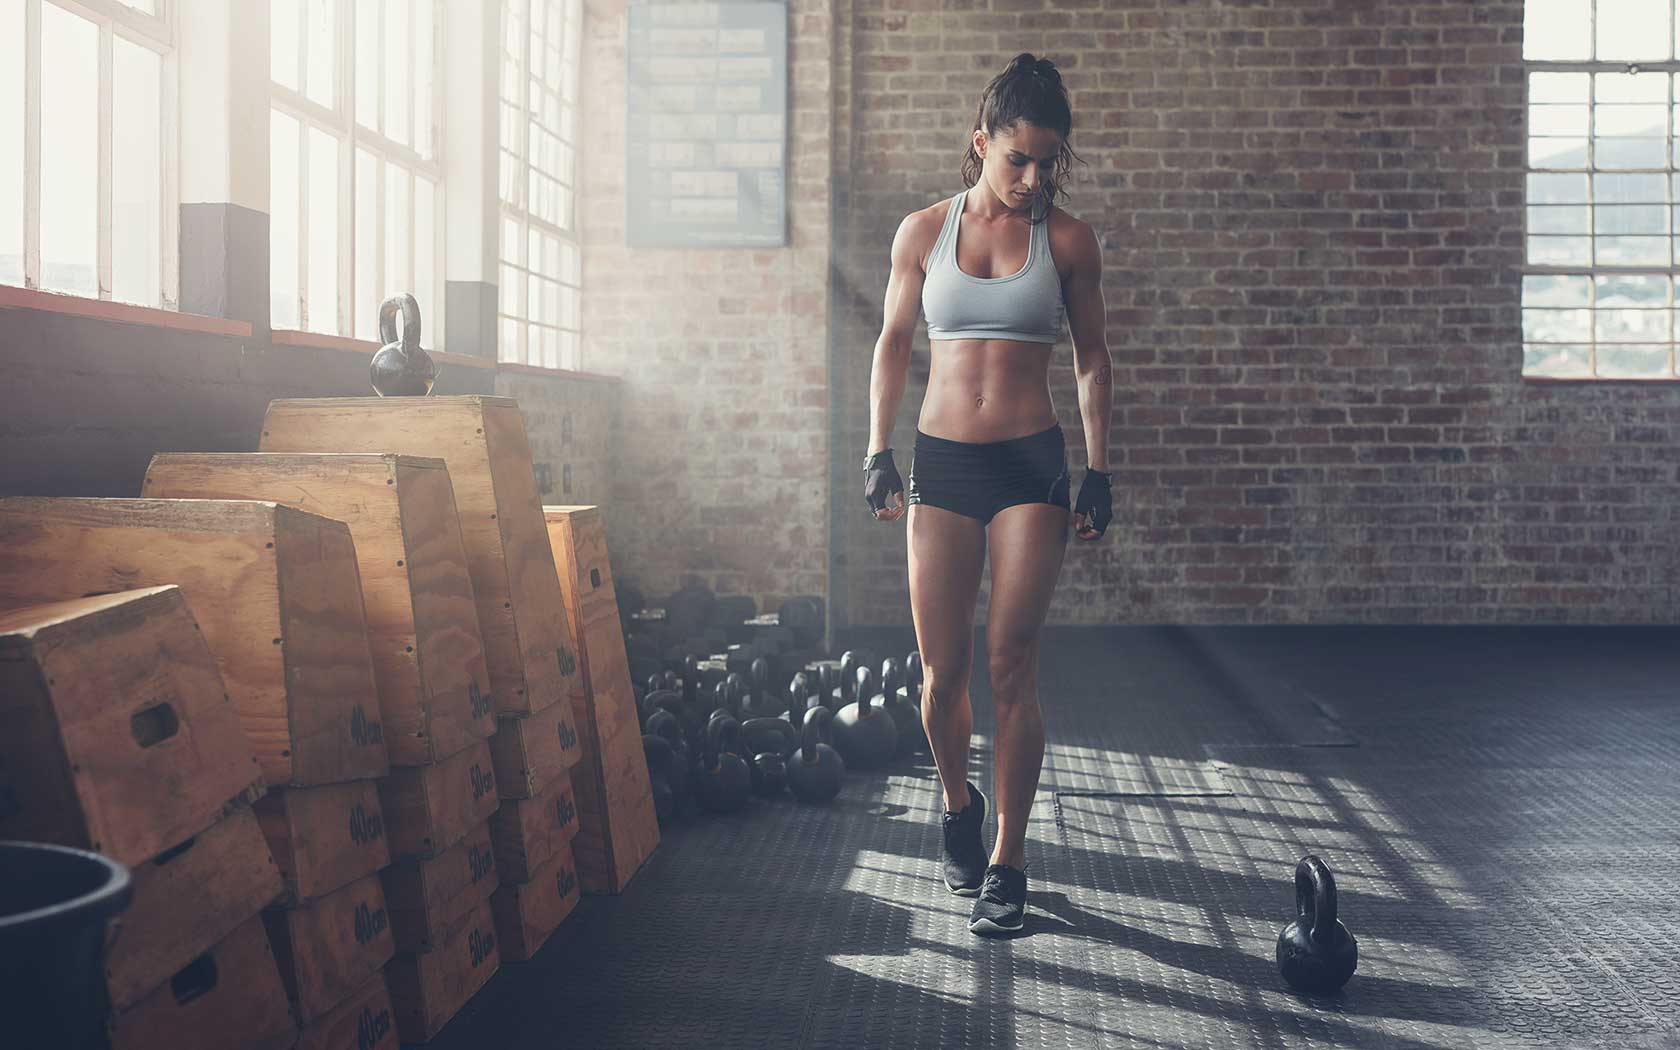 6 Minimalist Principles to Maximize Your Workouts